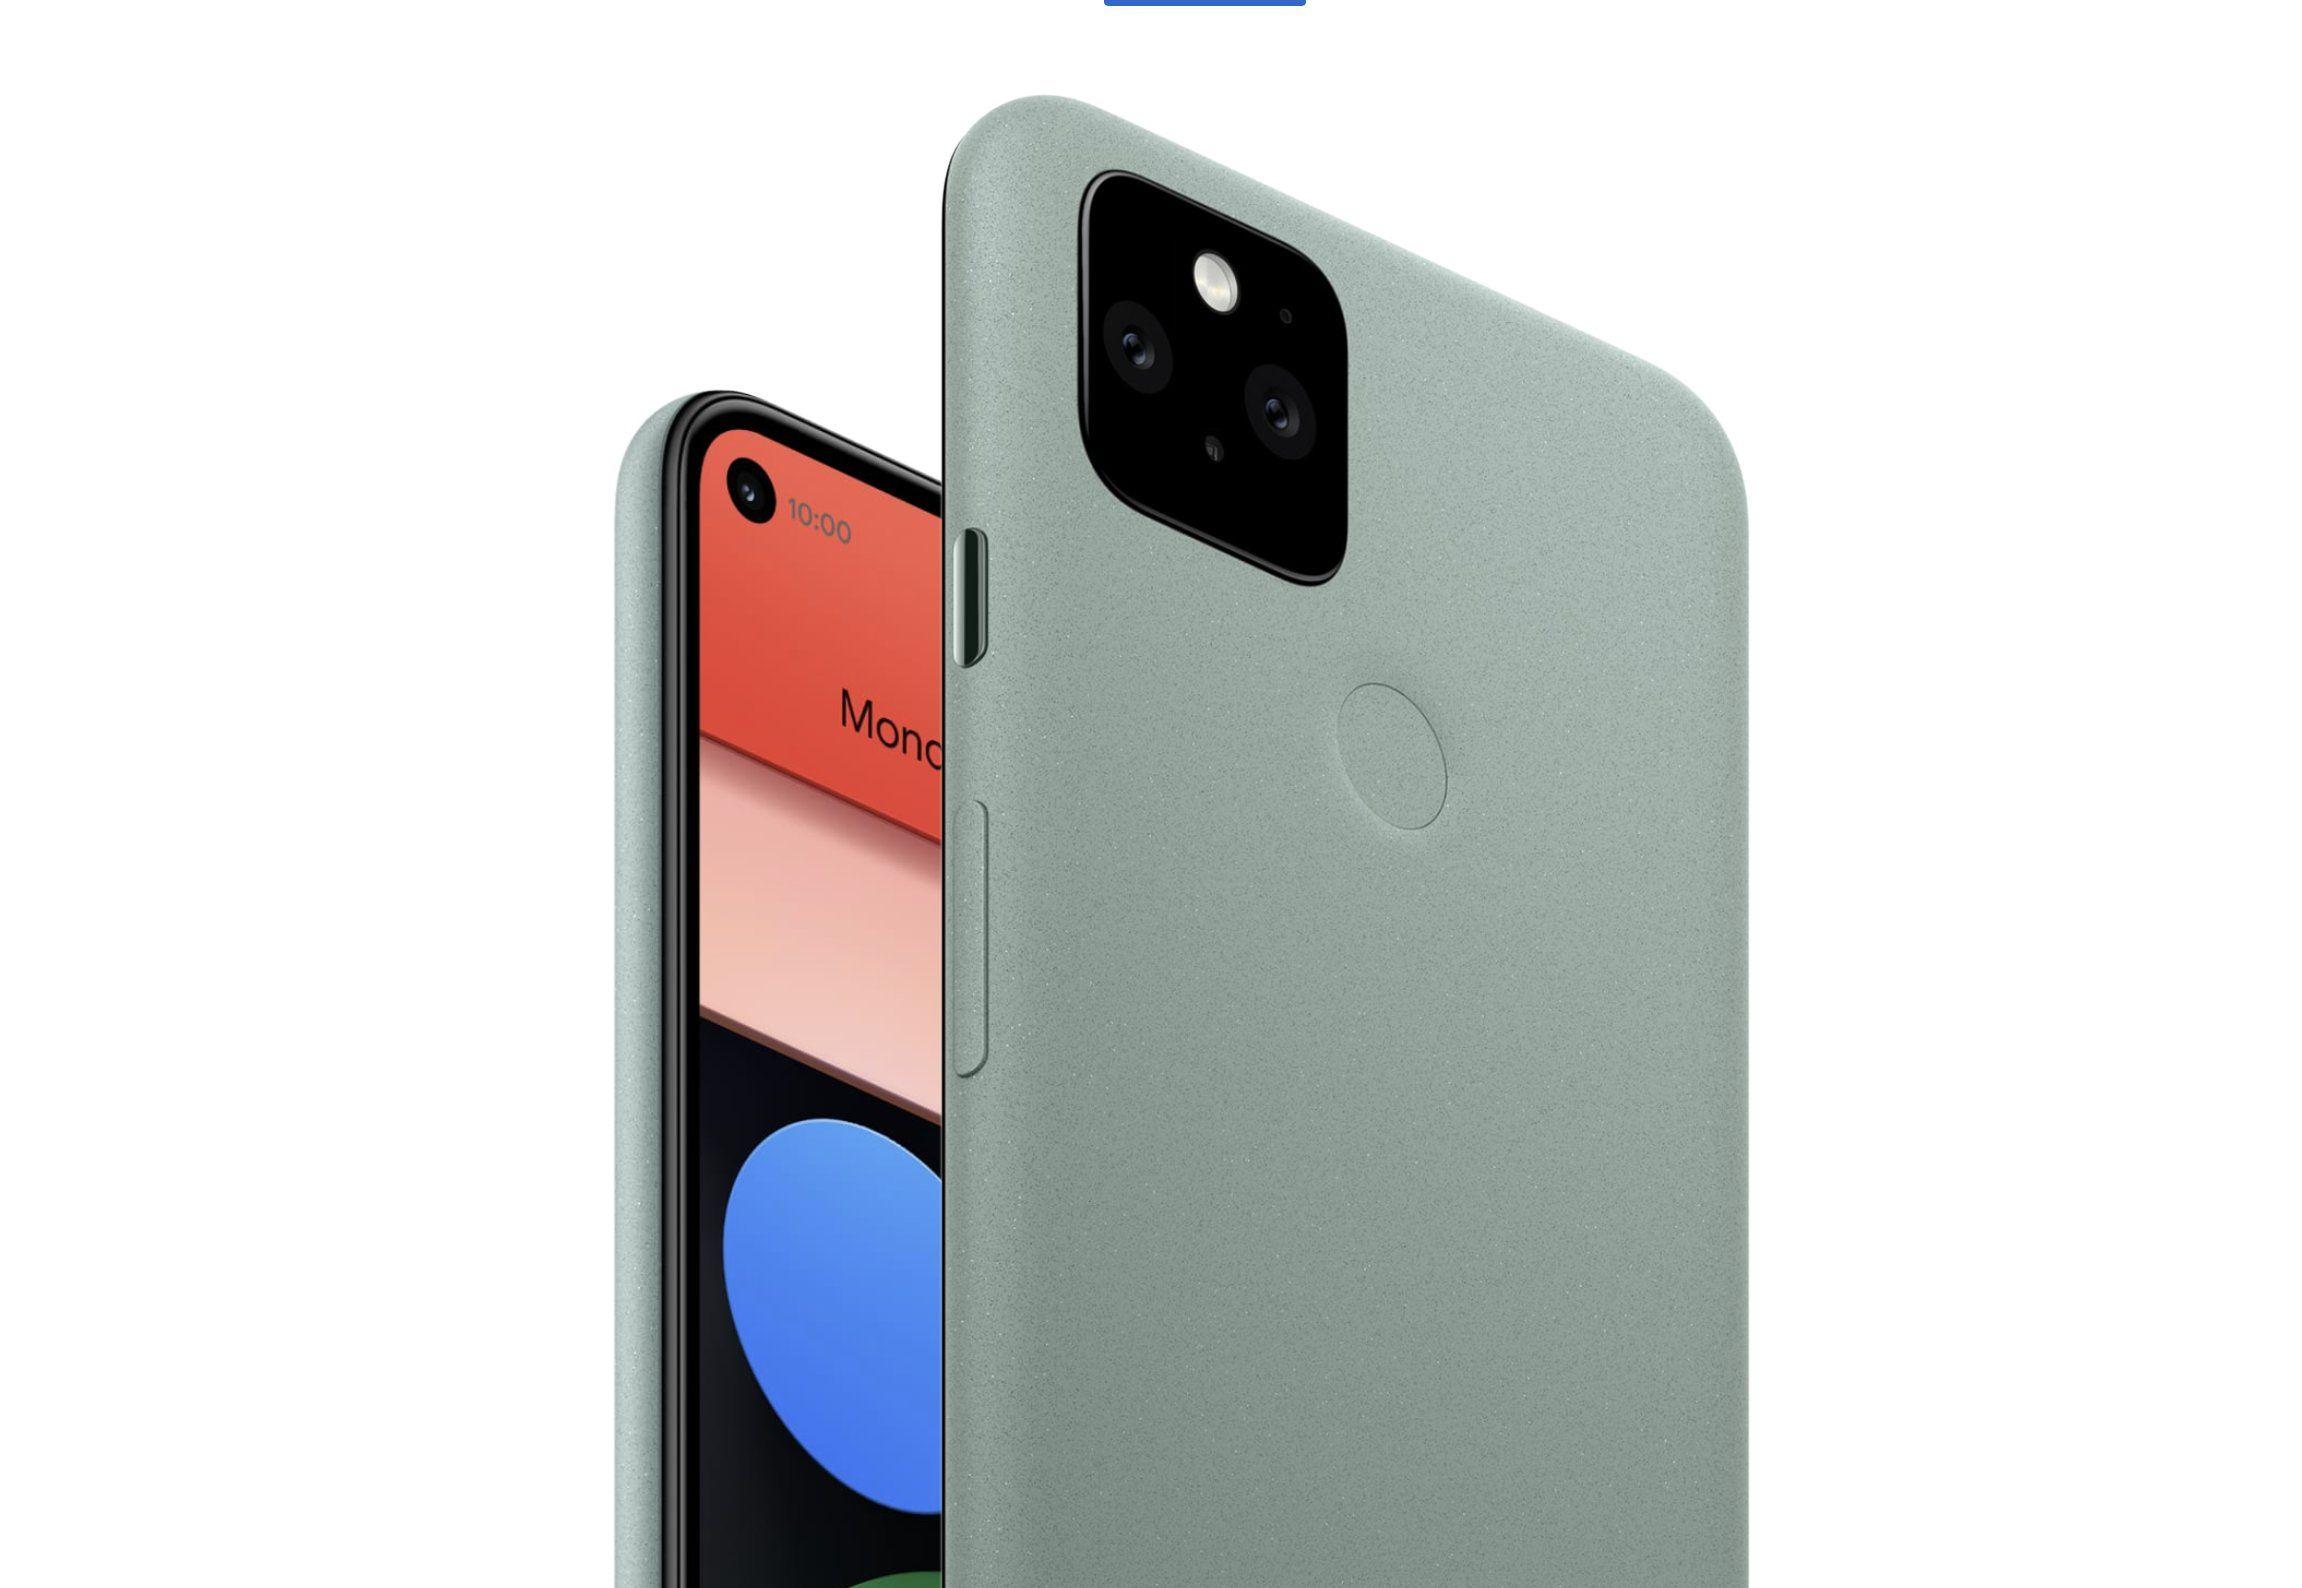 the indian gadget awards 2020 Best Mid-Range Camera Phone winner Google Pixel 4a runner up Vivo V20 Pro